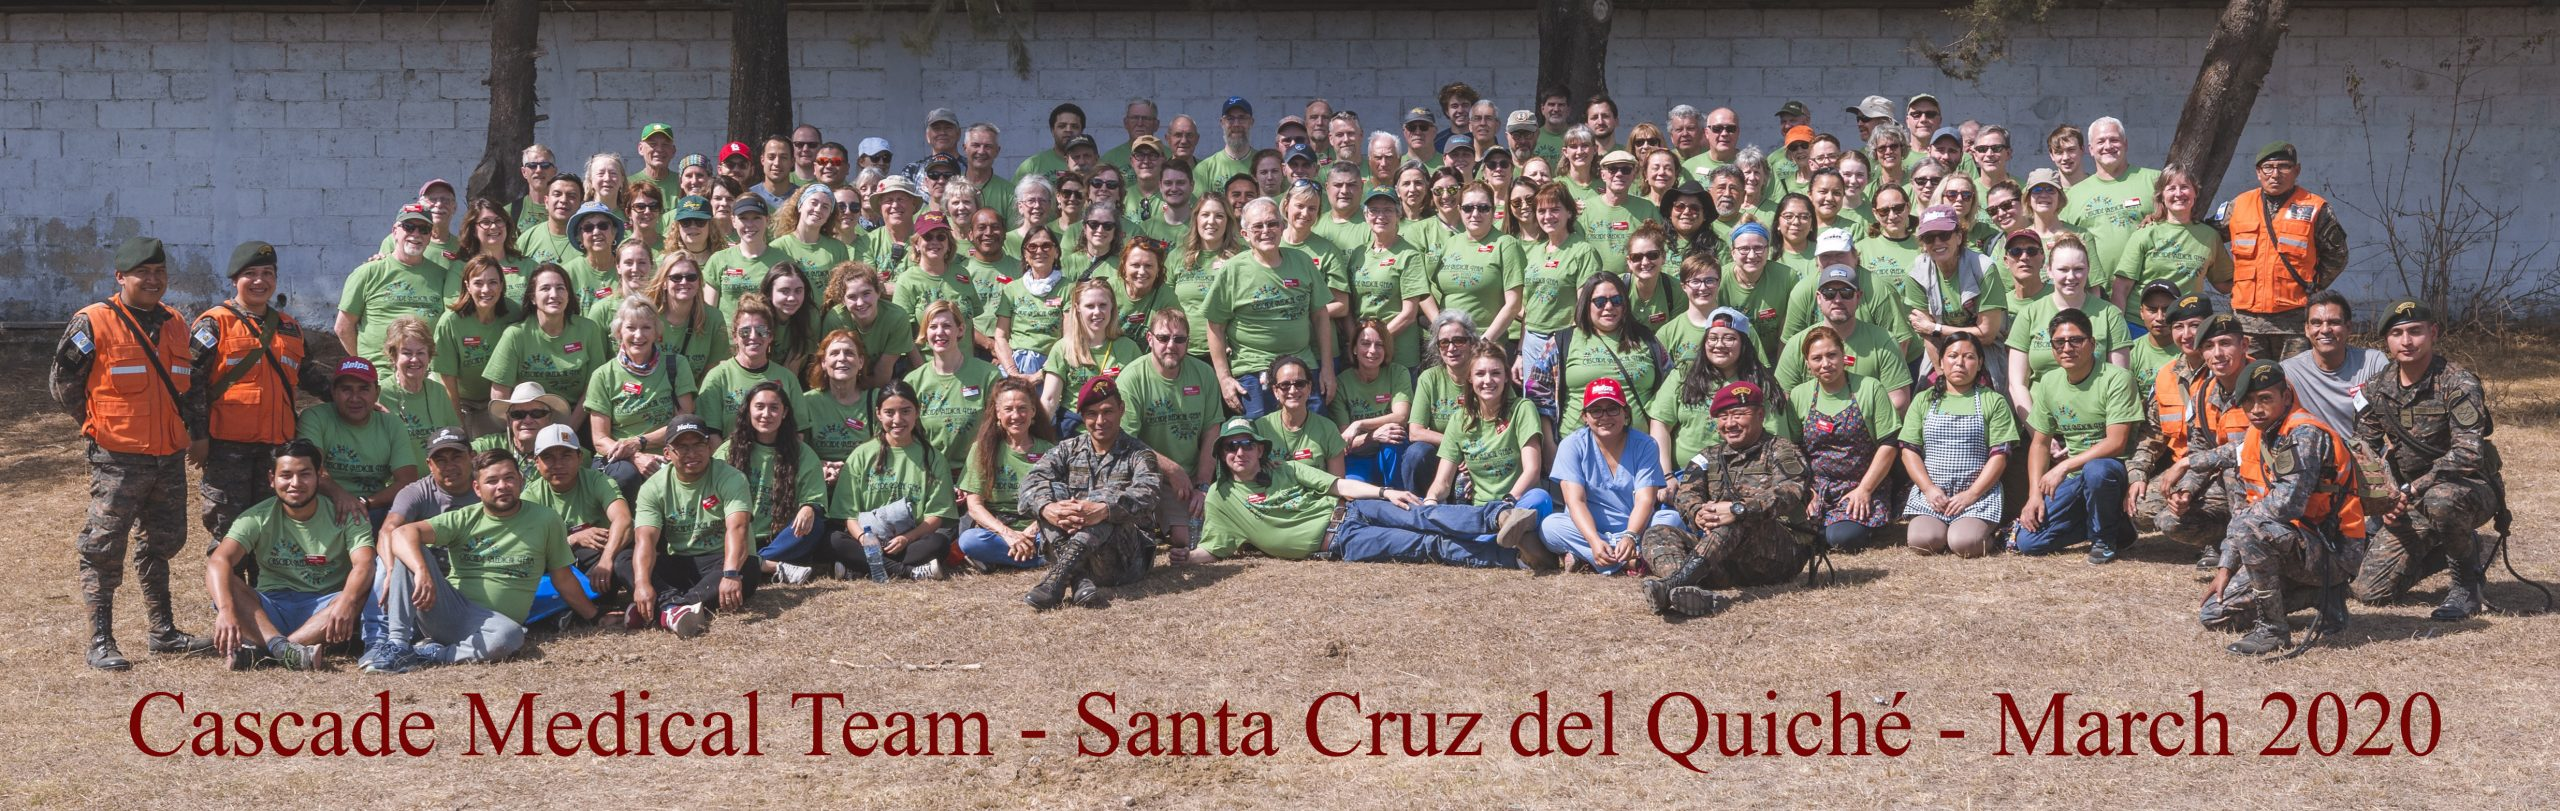 Cascade Medical Team, March 2020 group photo